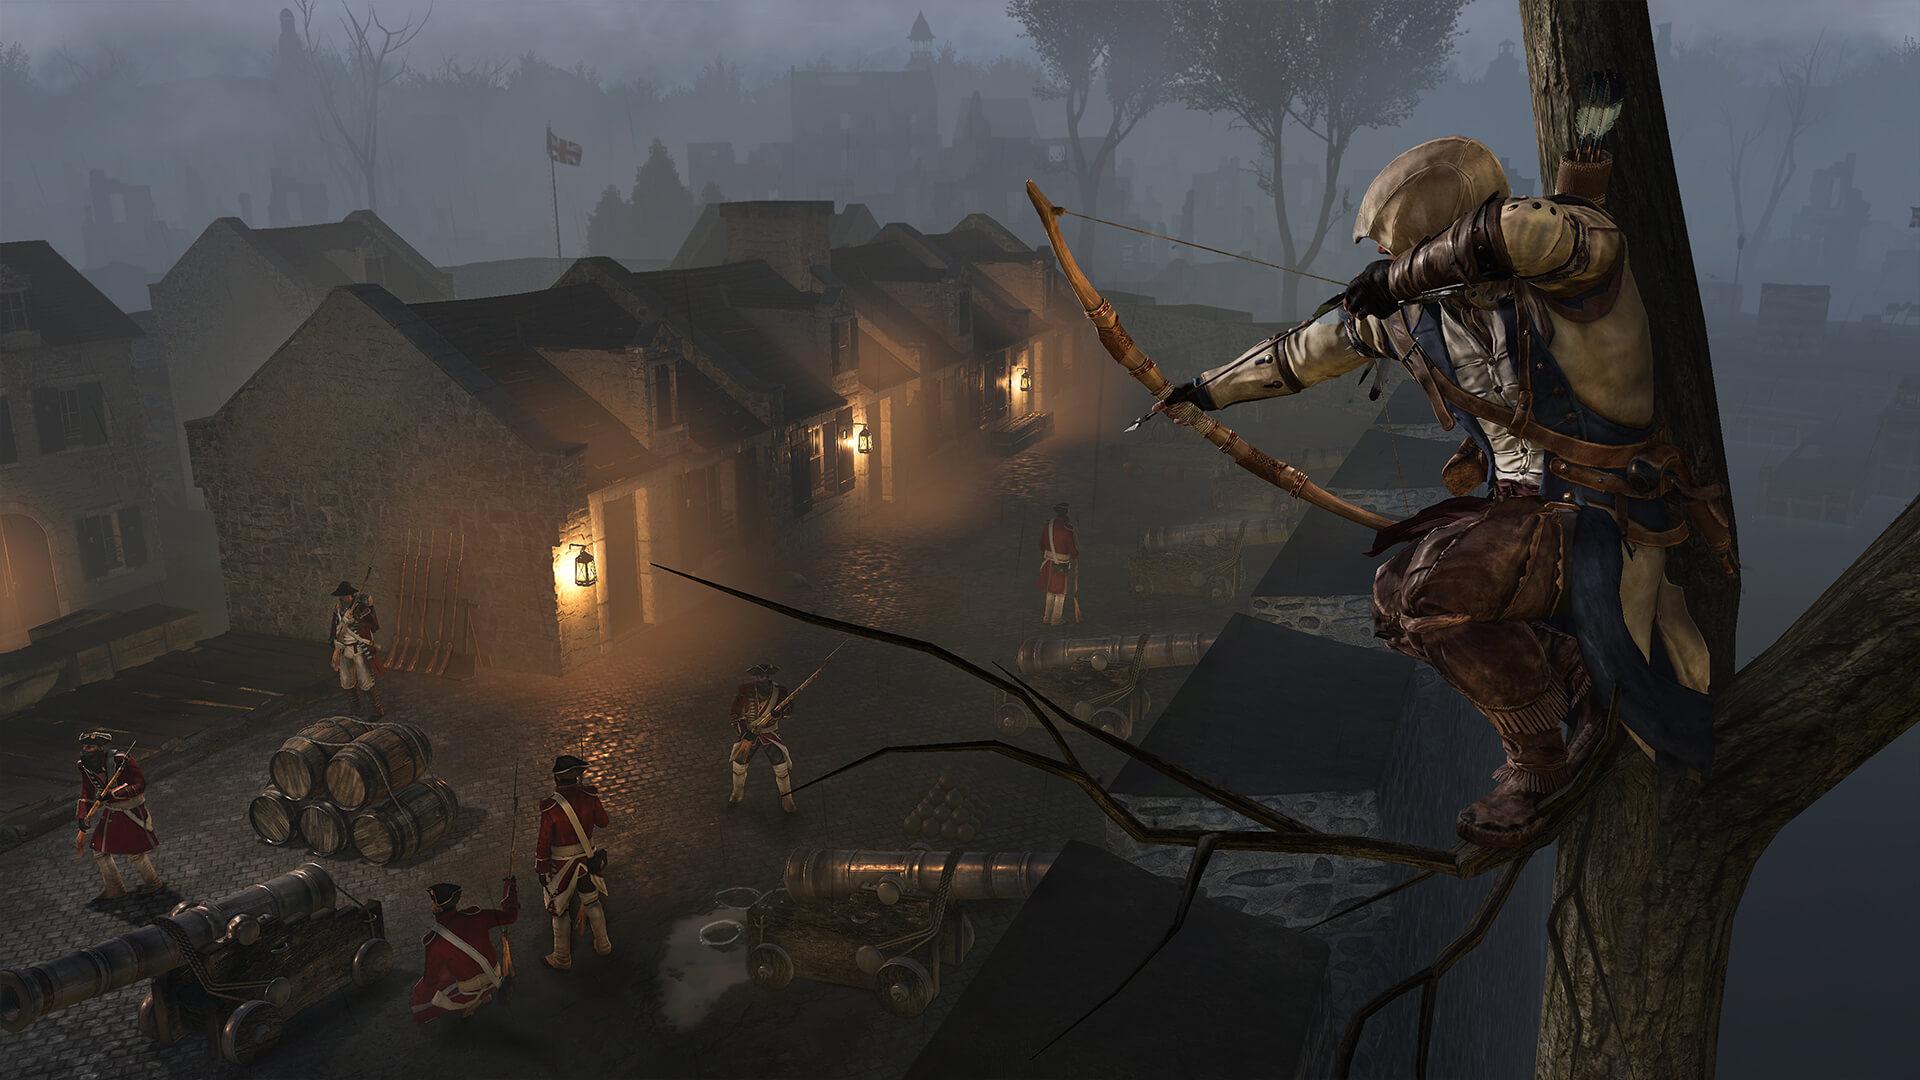 assassin's creed 3 oyun hikaye